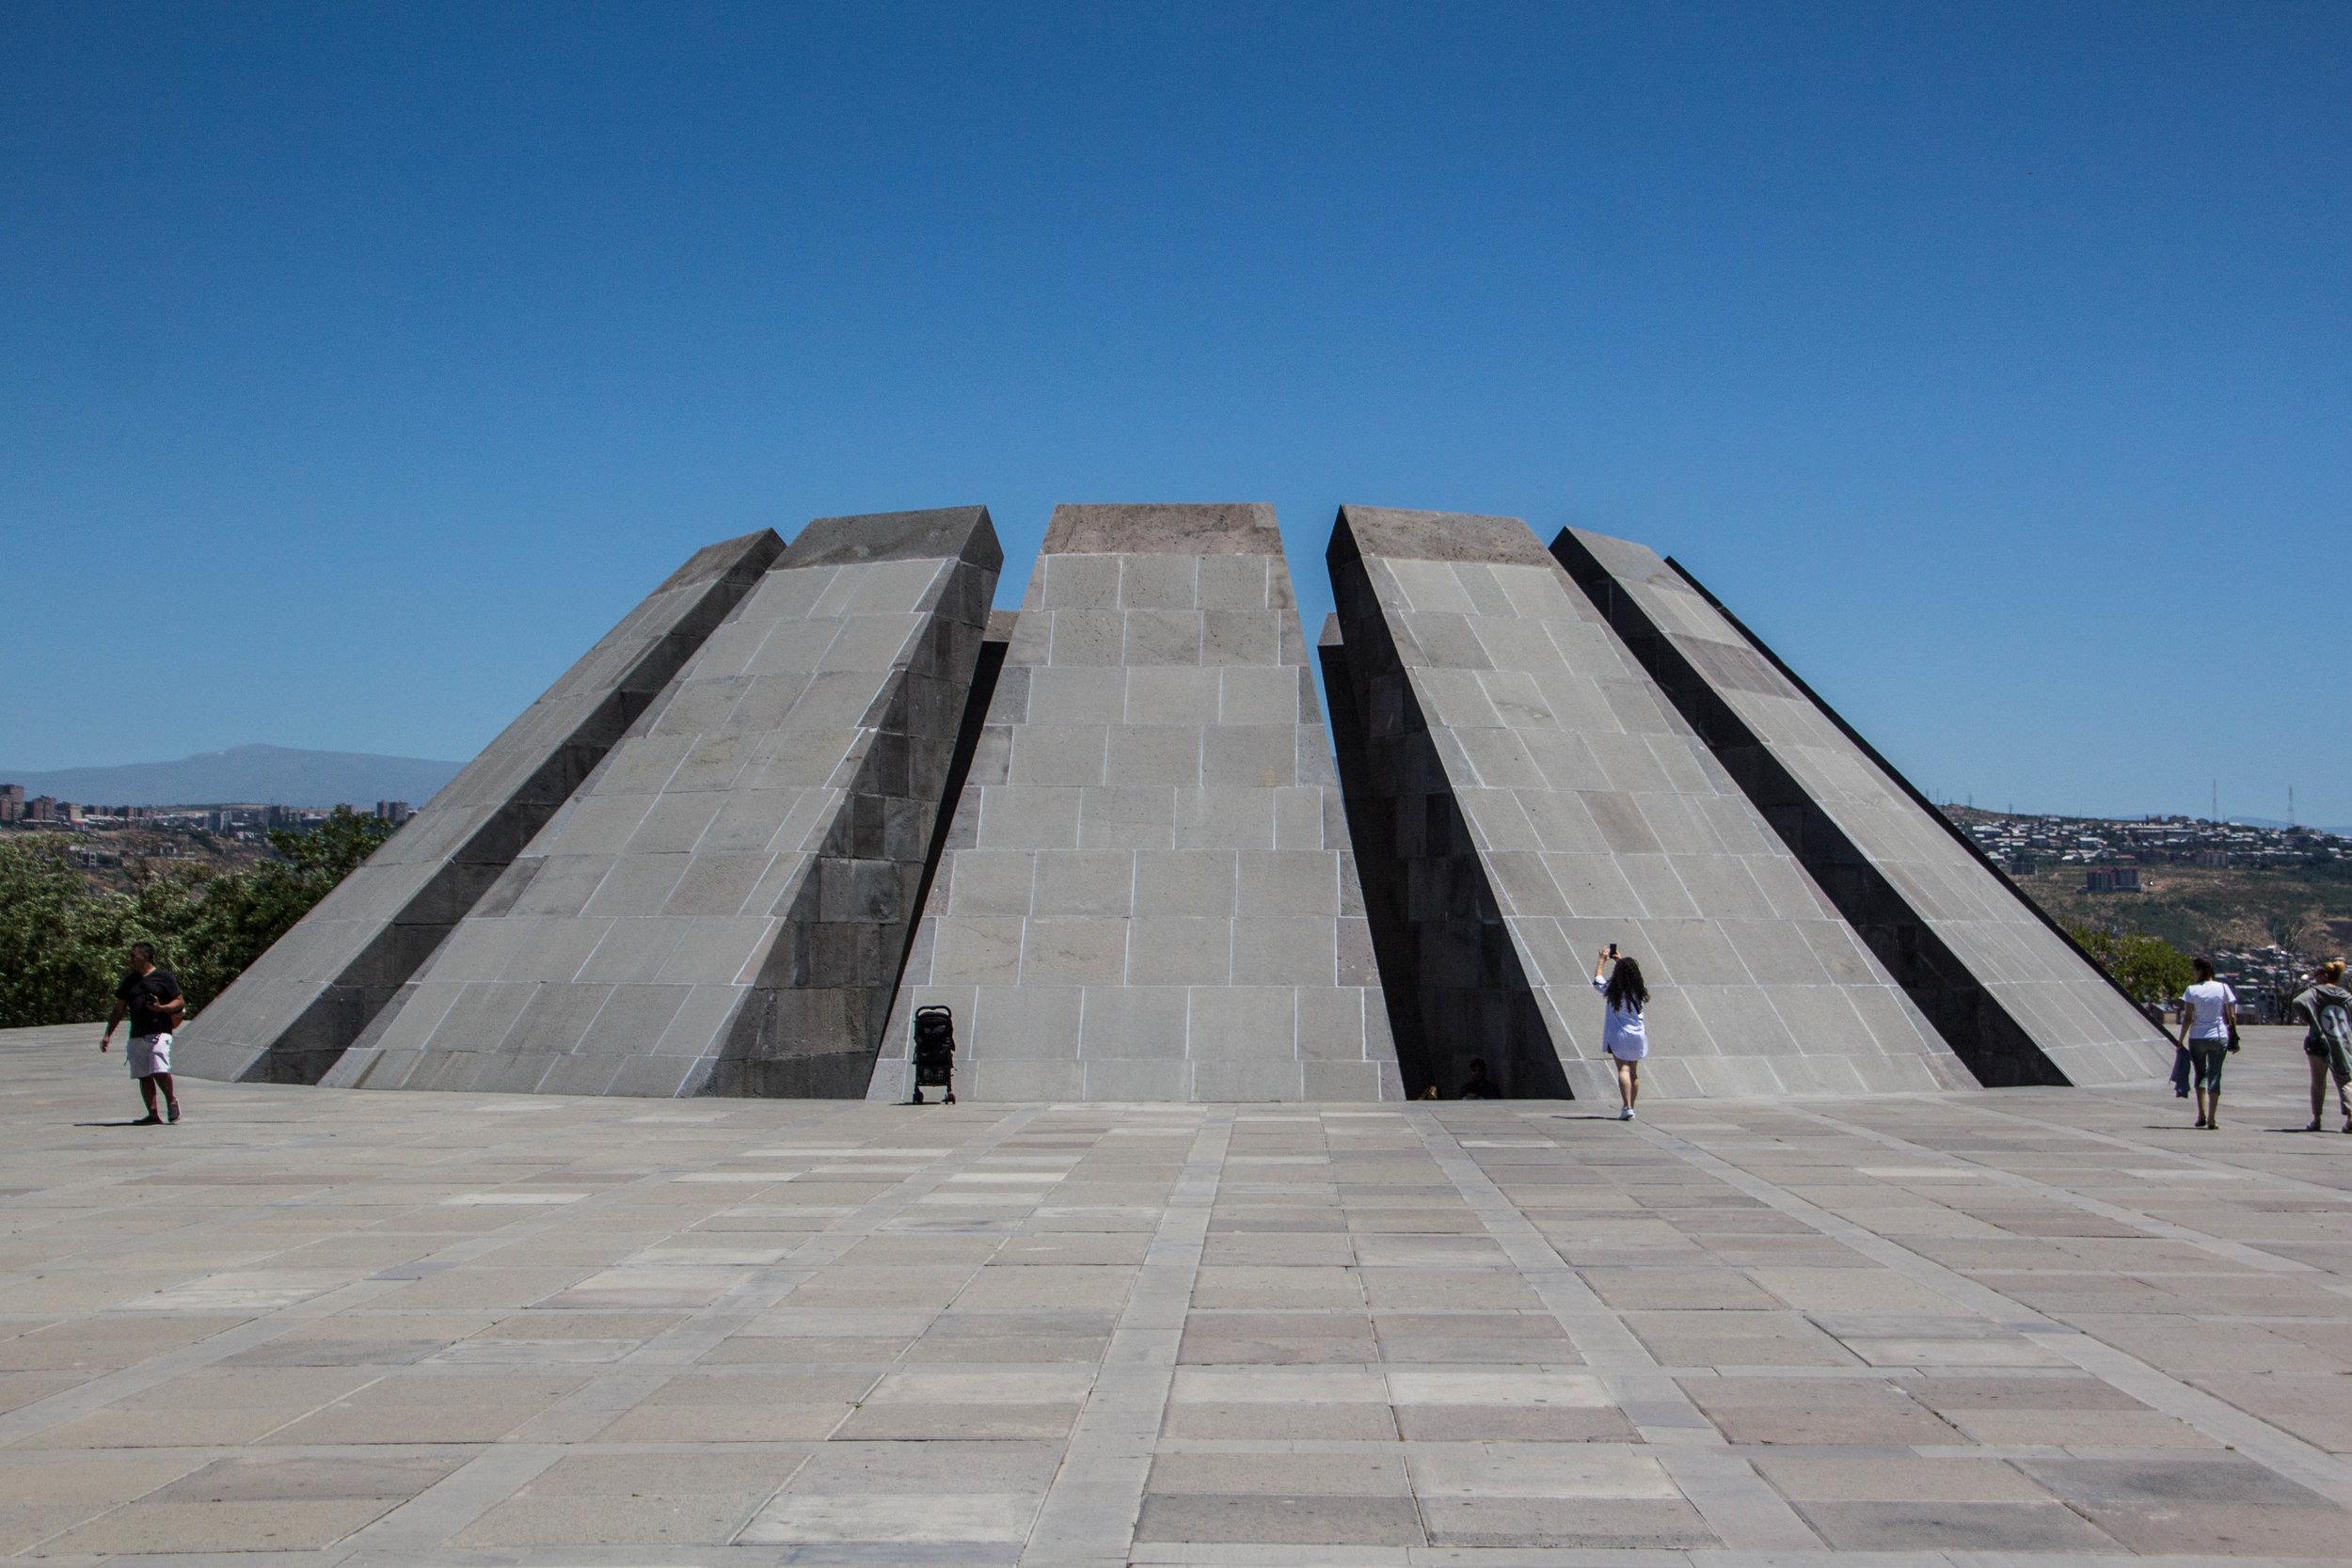 tsitsernakaberd-armenian-genocide-memorial-35.jpg